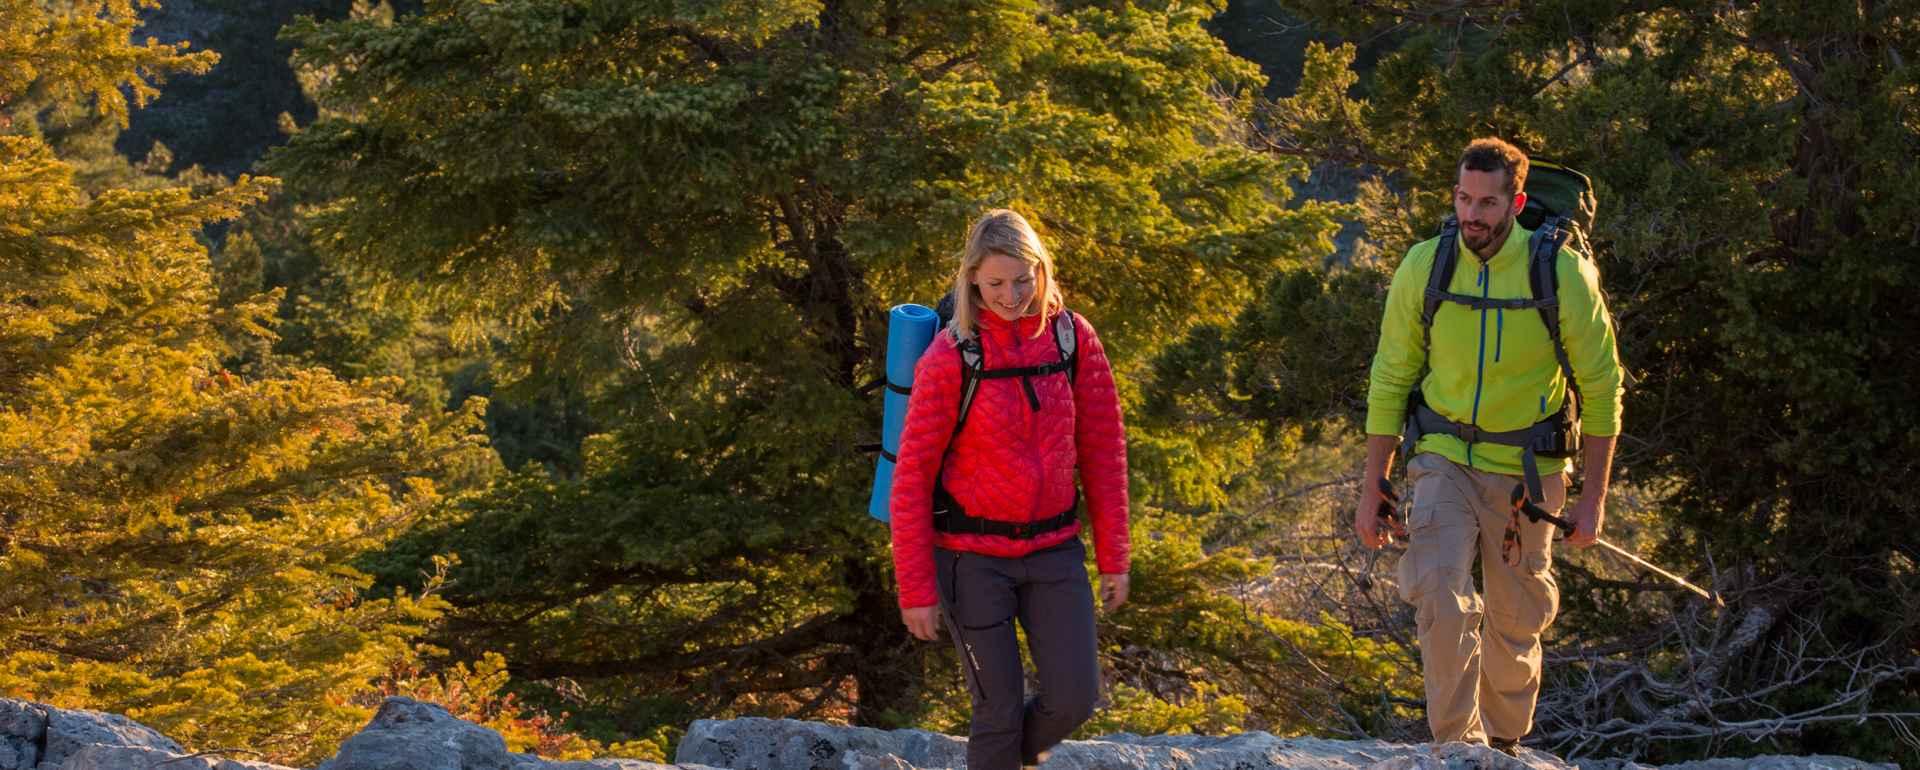 Trekkingszene am Alacabel-Pass, Taurus Gebirge, Tuerkei.